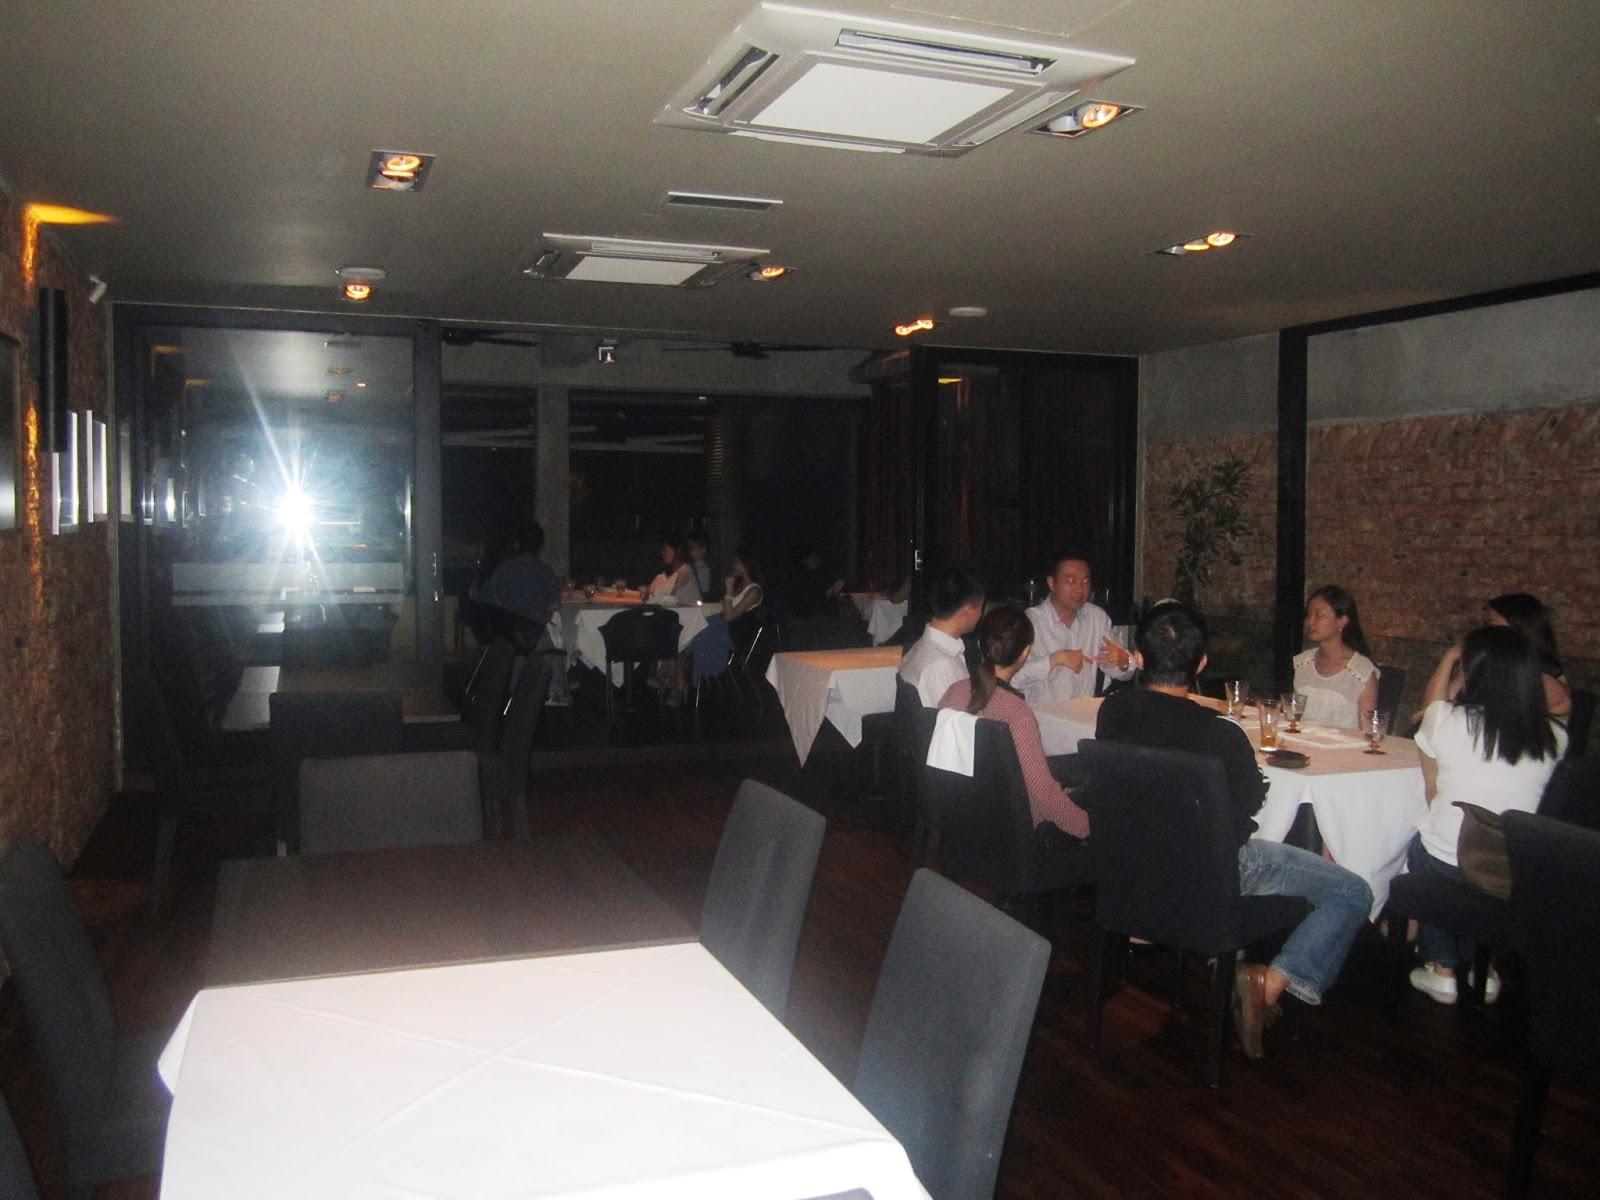 Talkwok leonardo s dining room and loft bangsar for Leonardo s dining room